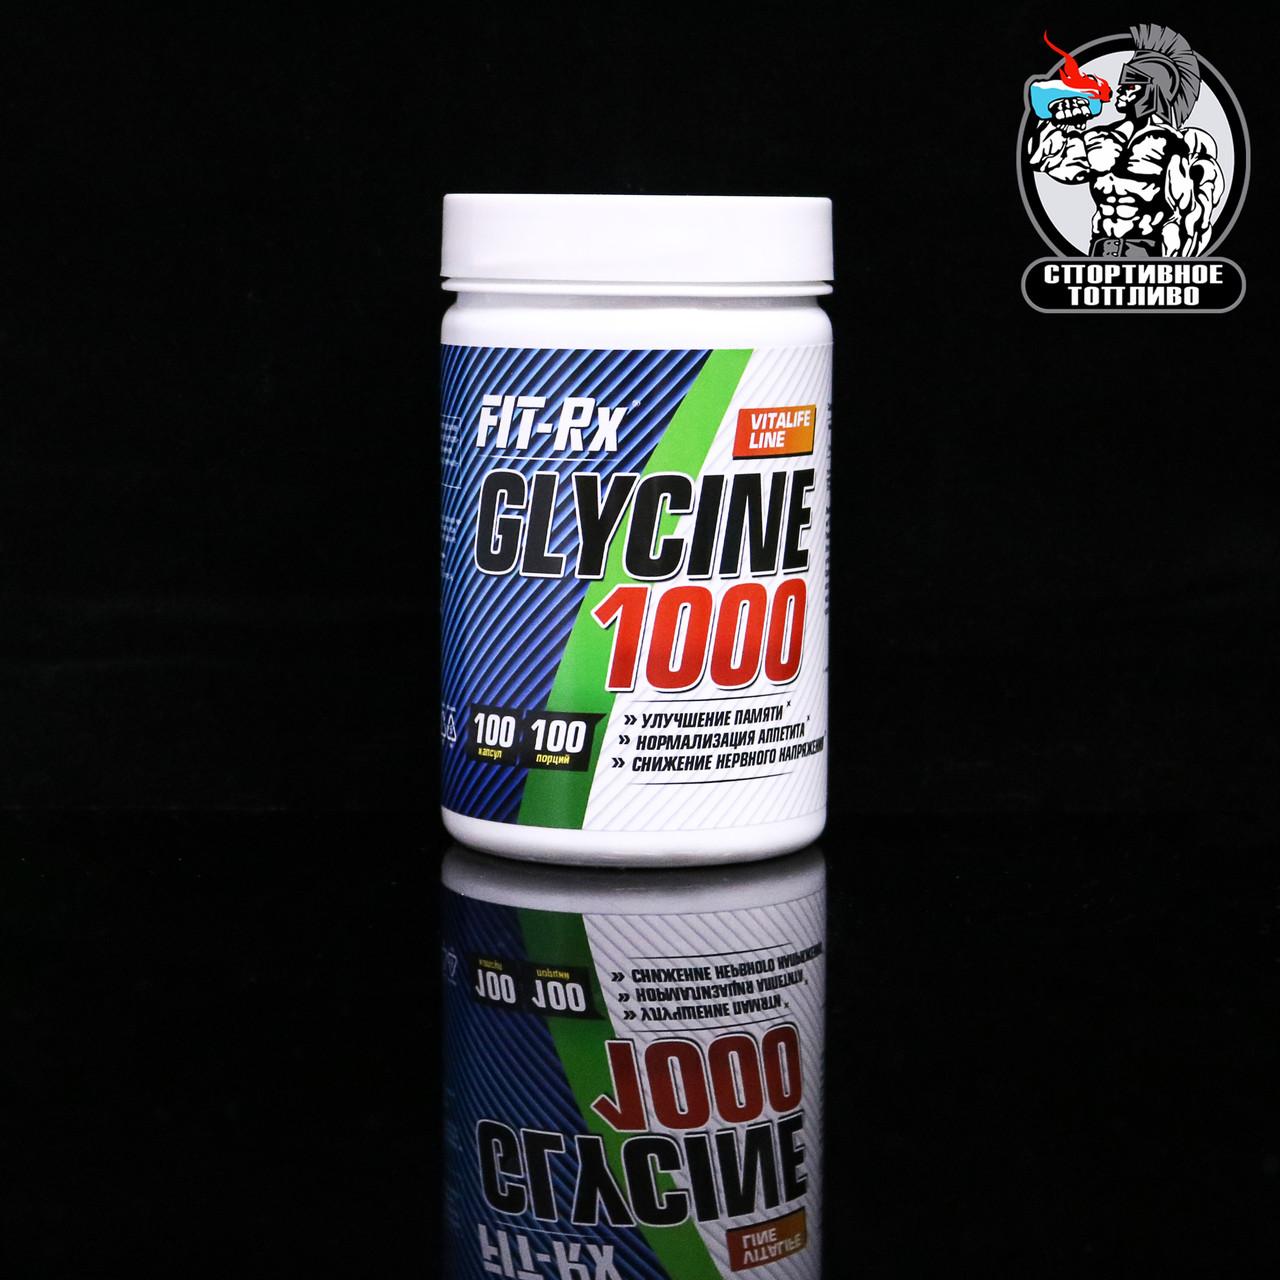 Fit-Rx - Glycine 1000 100капс/100порций)